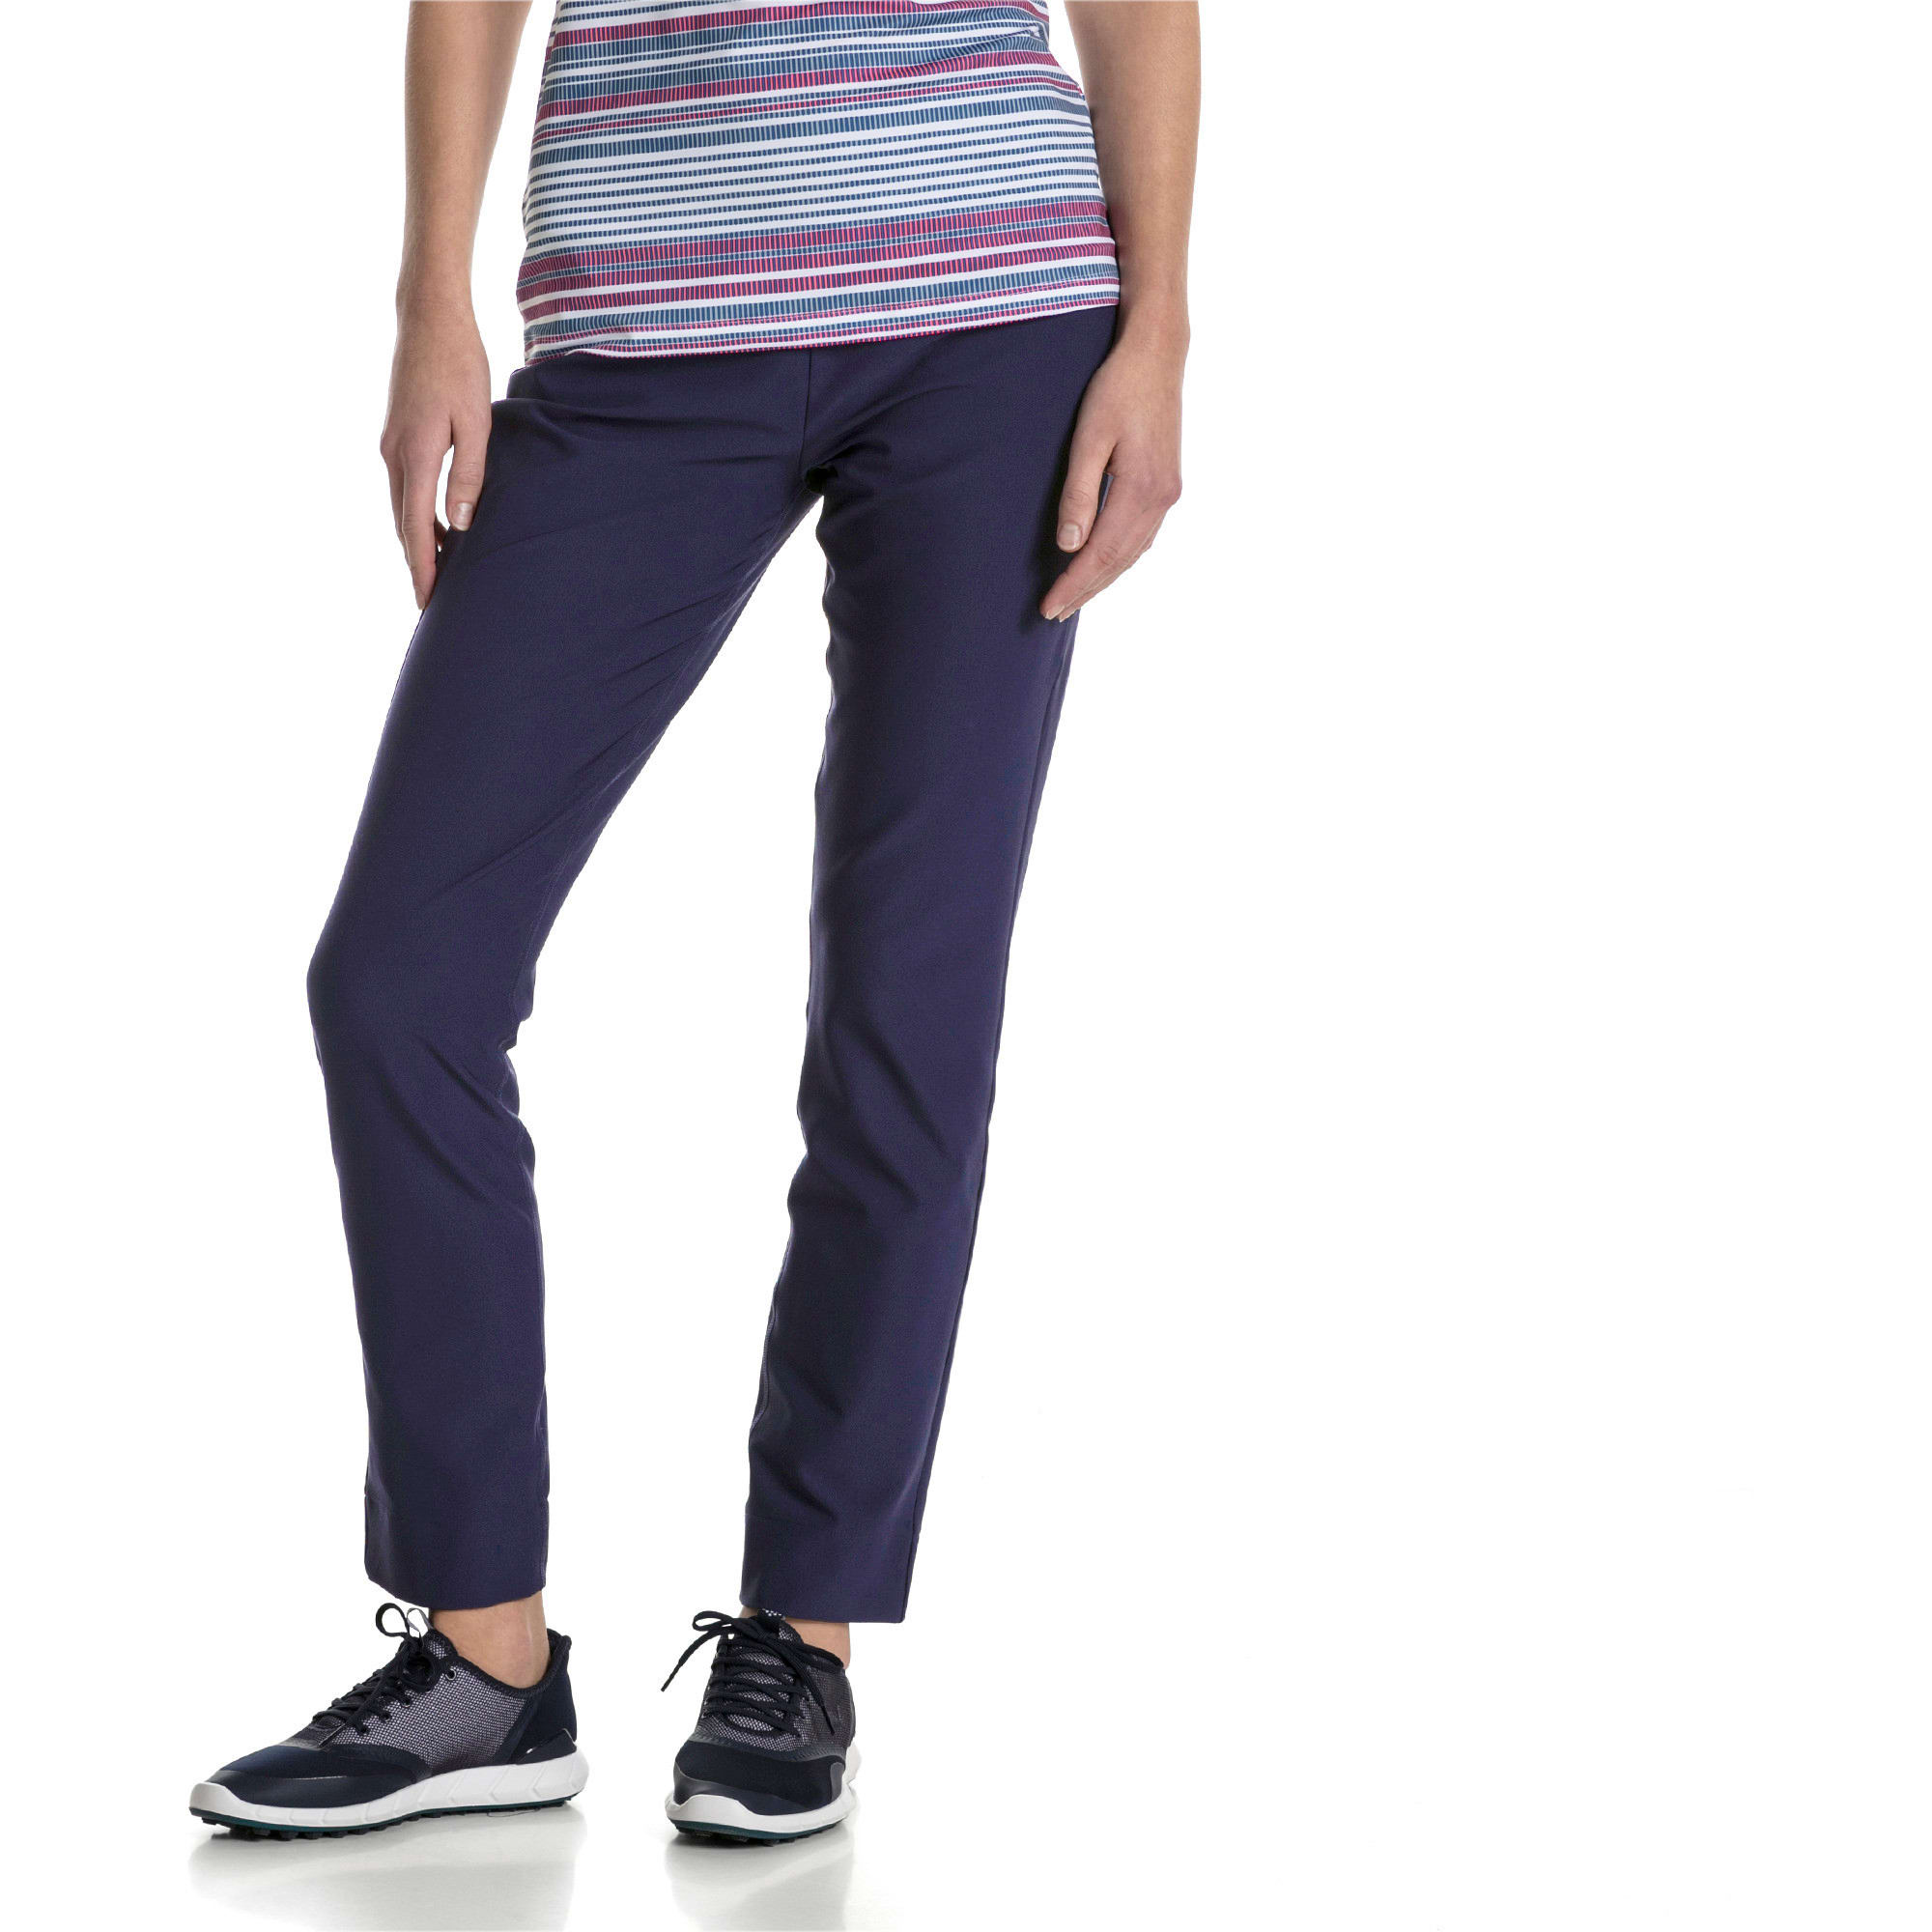 Thumbnail 1 of Golf Women's PWRSHAPE Pull On Pants, Peacoat, medium